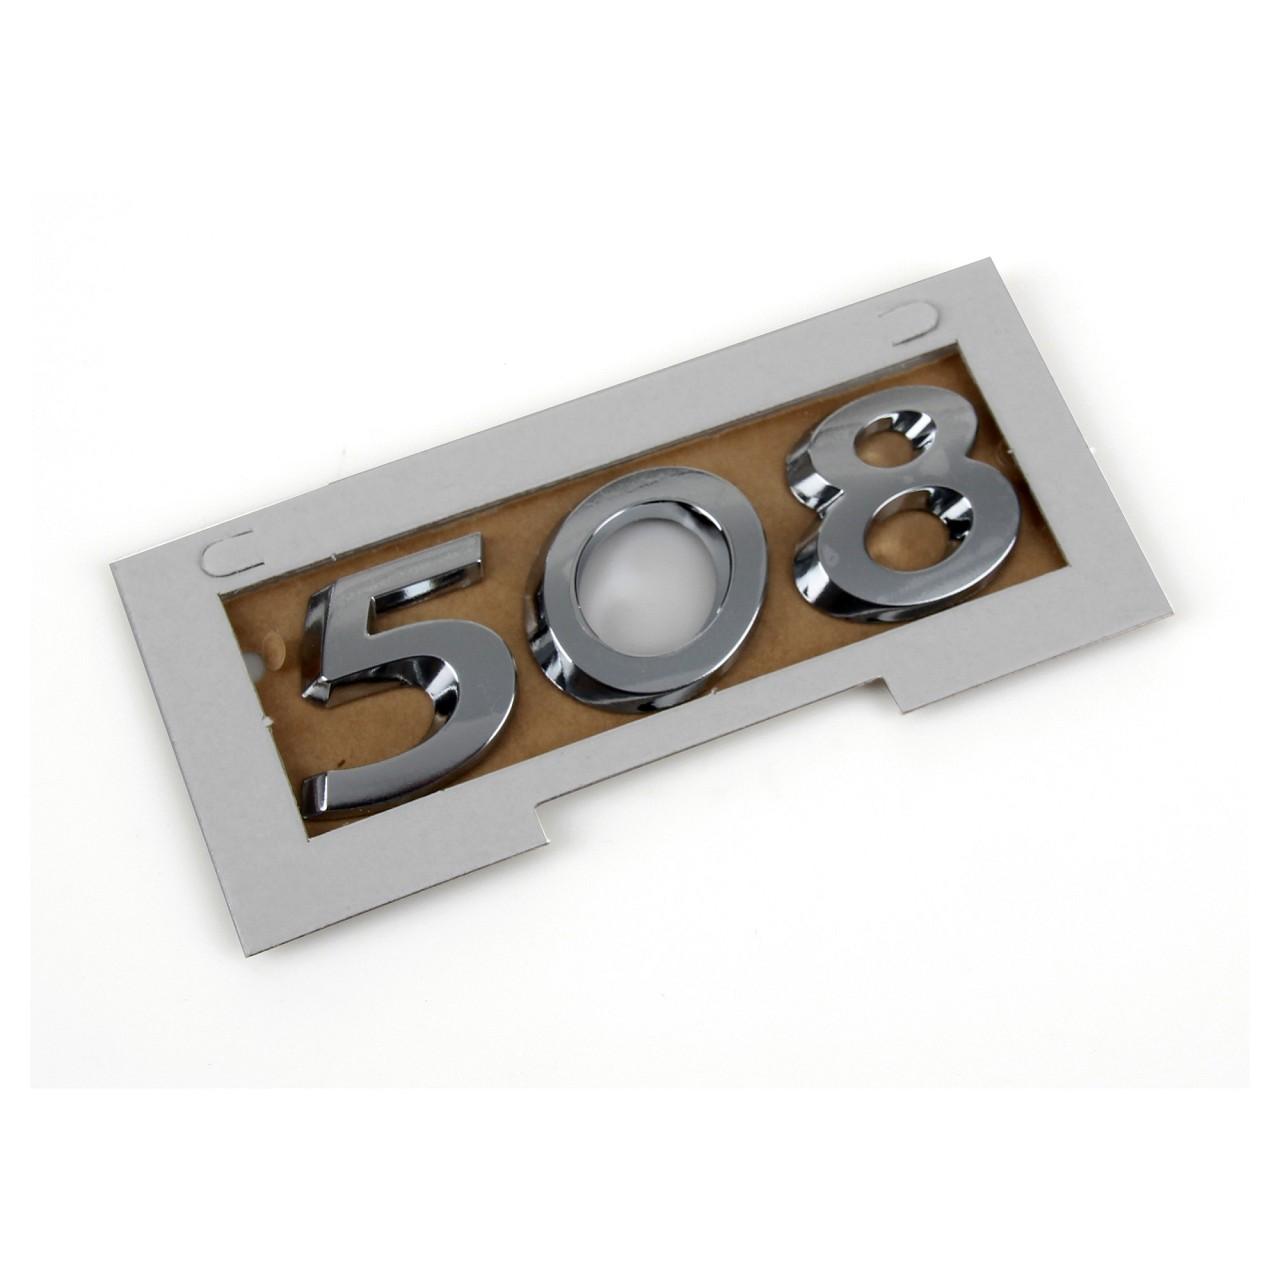 ORIGINAL Peugeot Emblem Plakette Schriftzug Heckklappe CHROM 8666.CY für 508